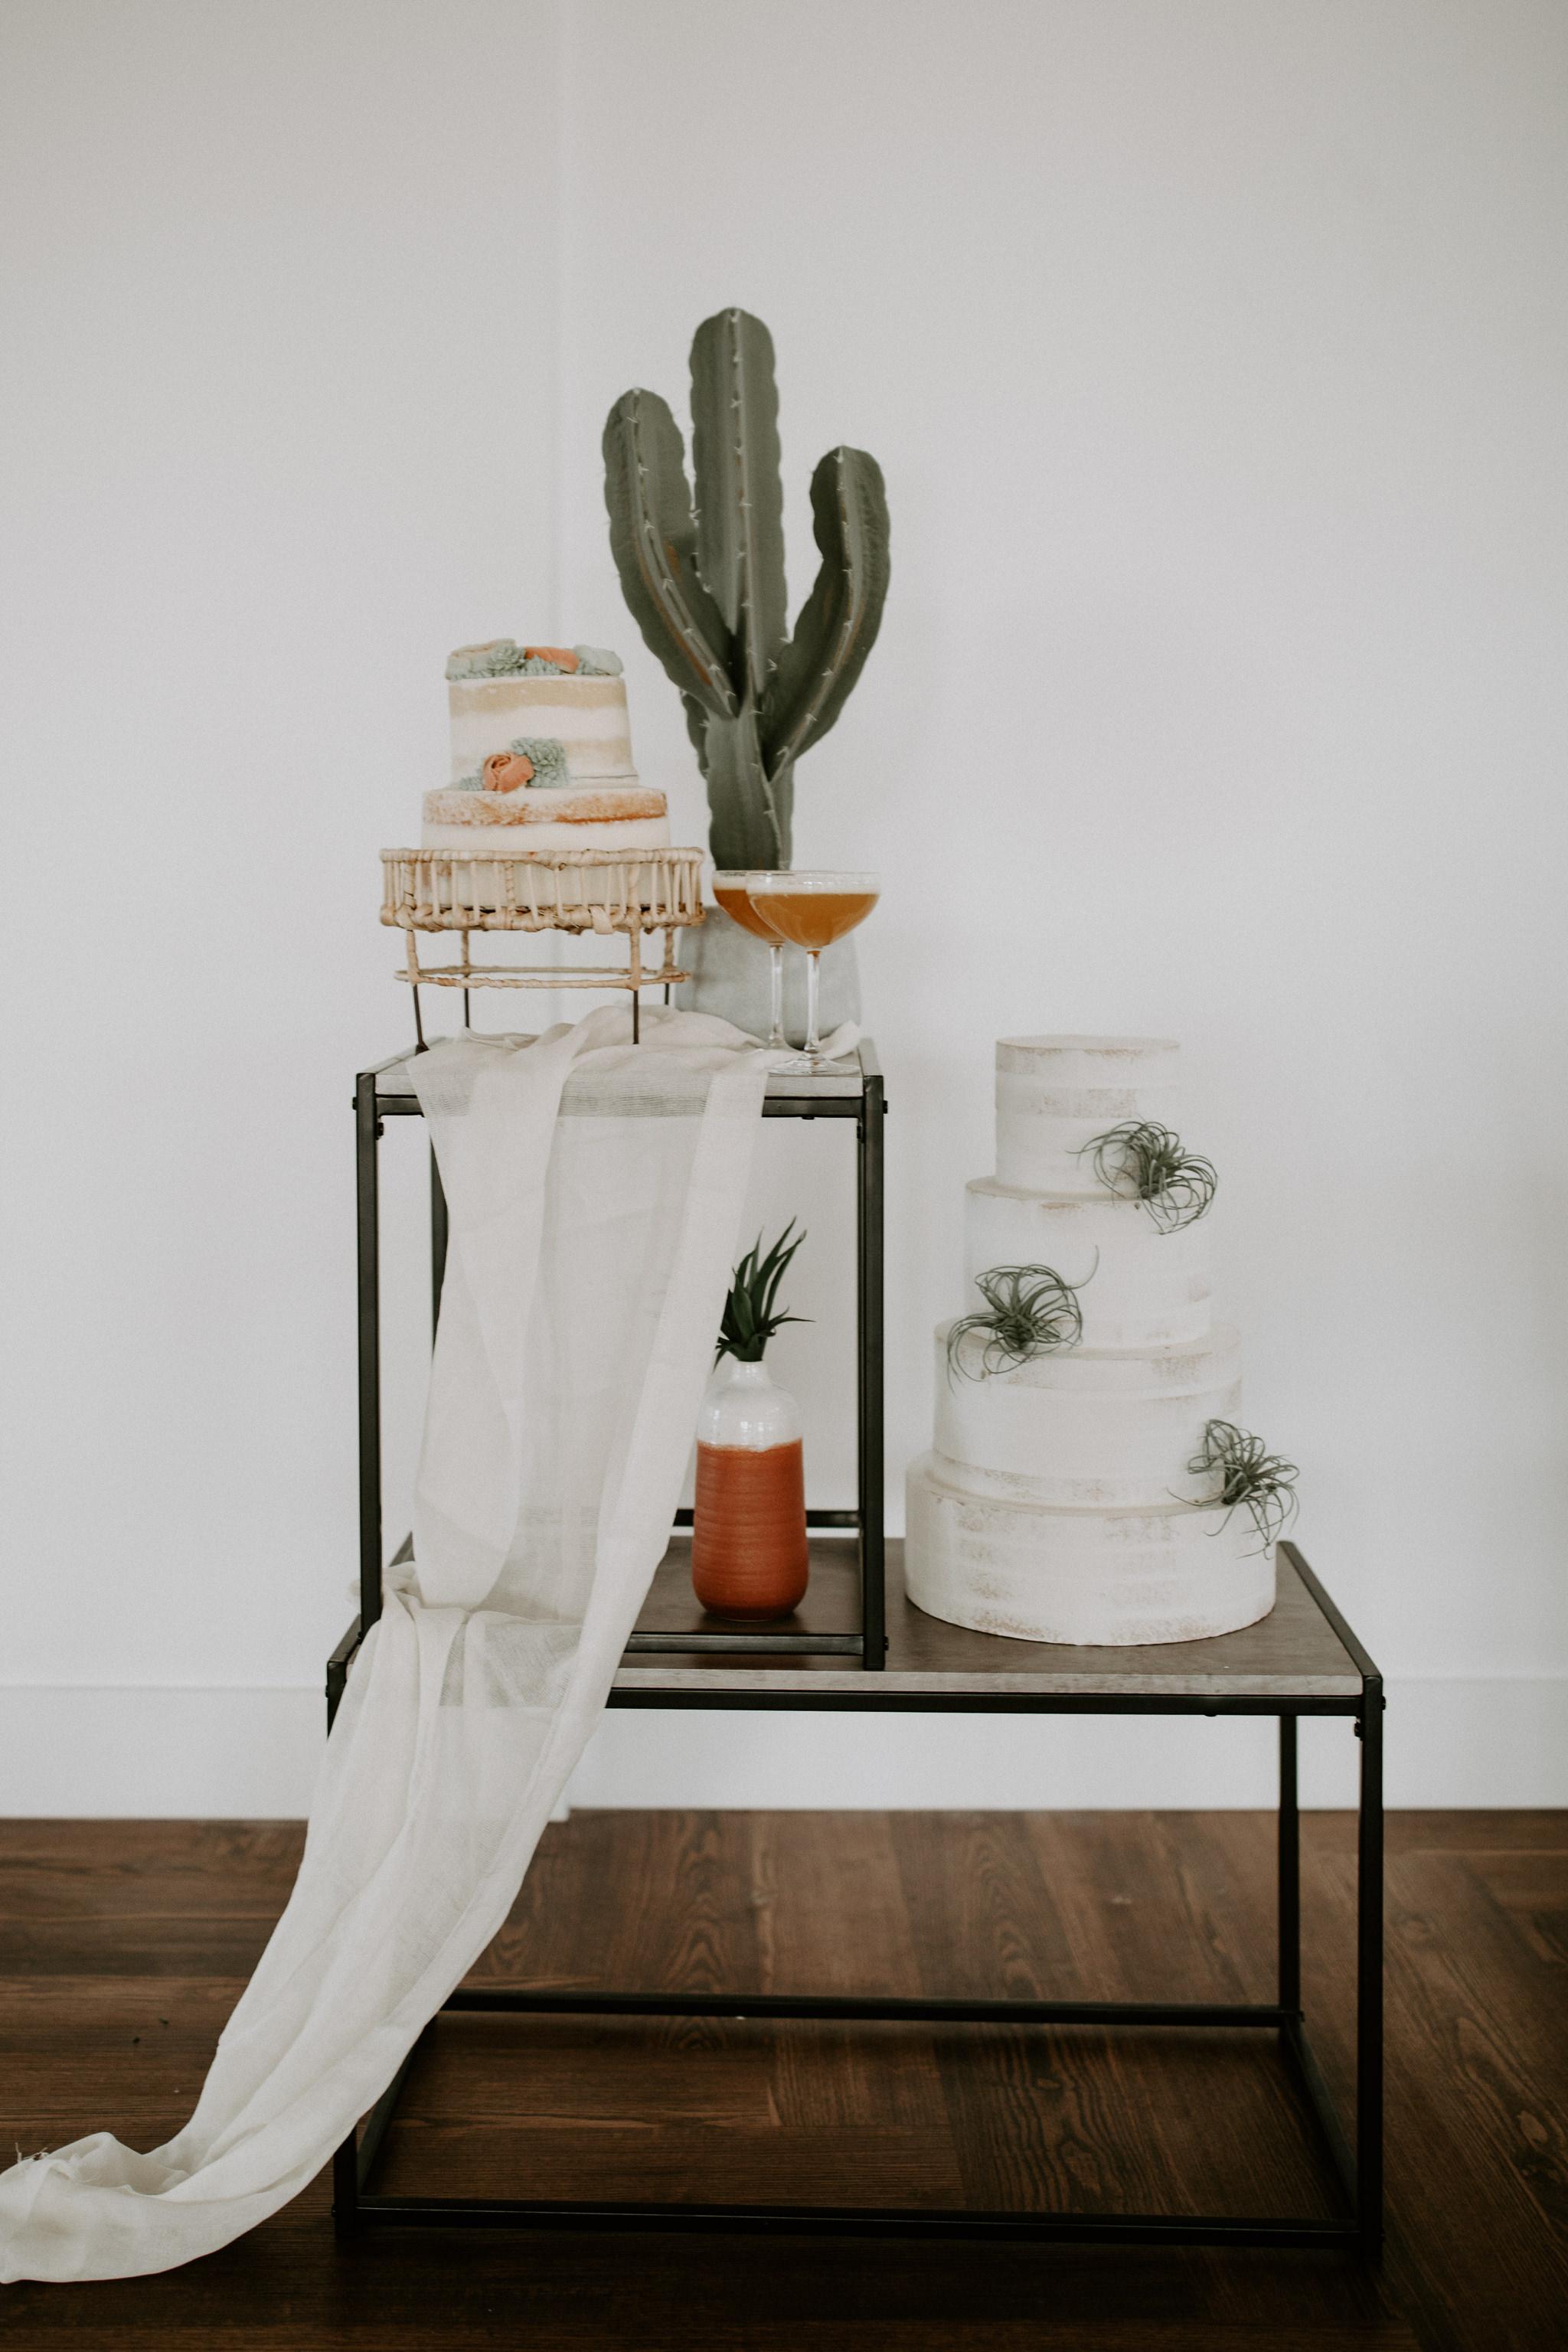 Modern cake with cactus